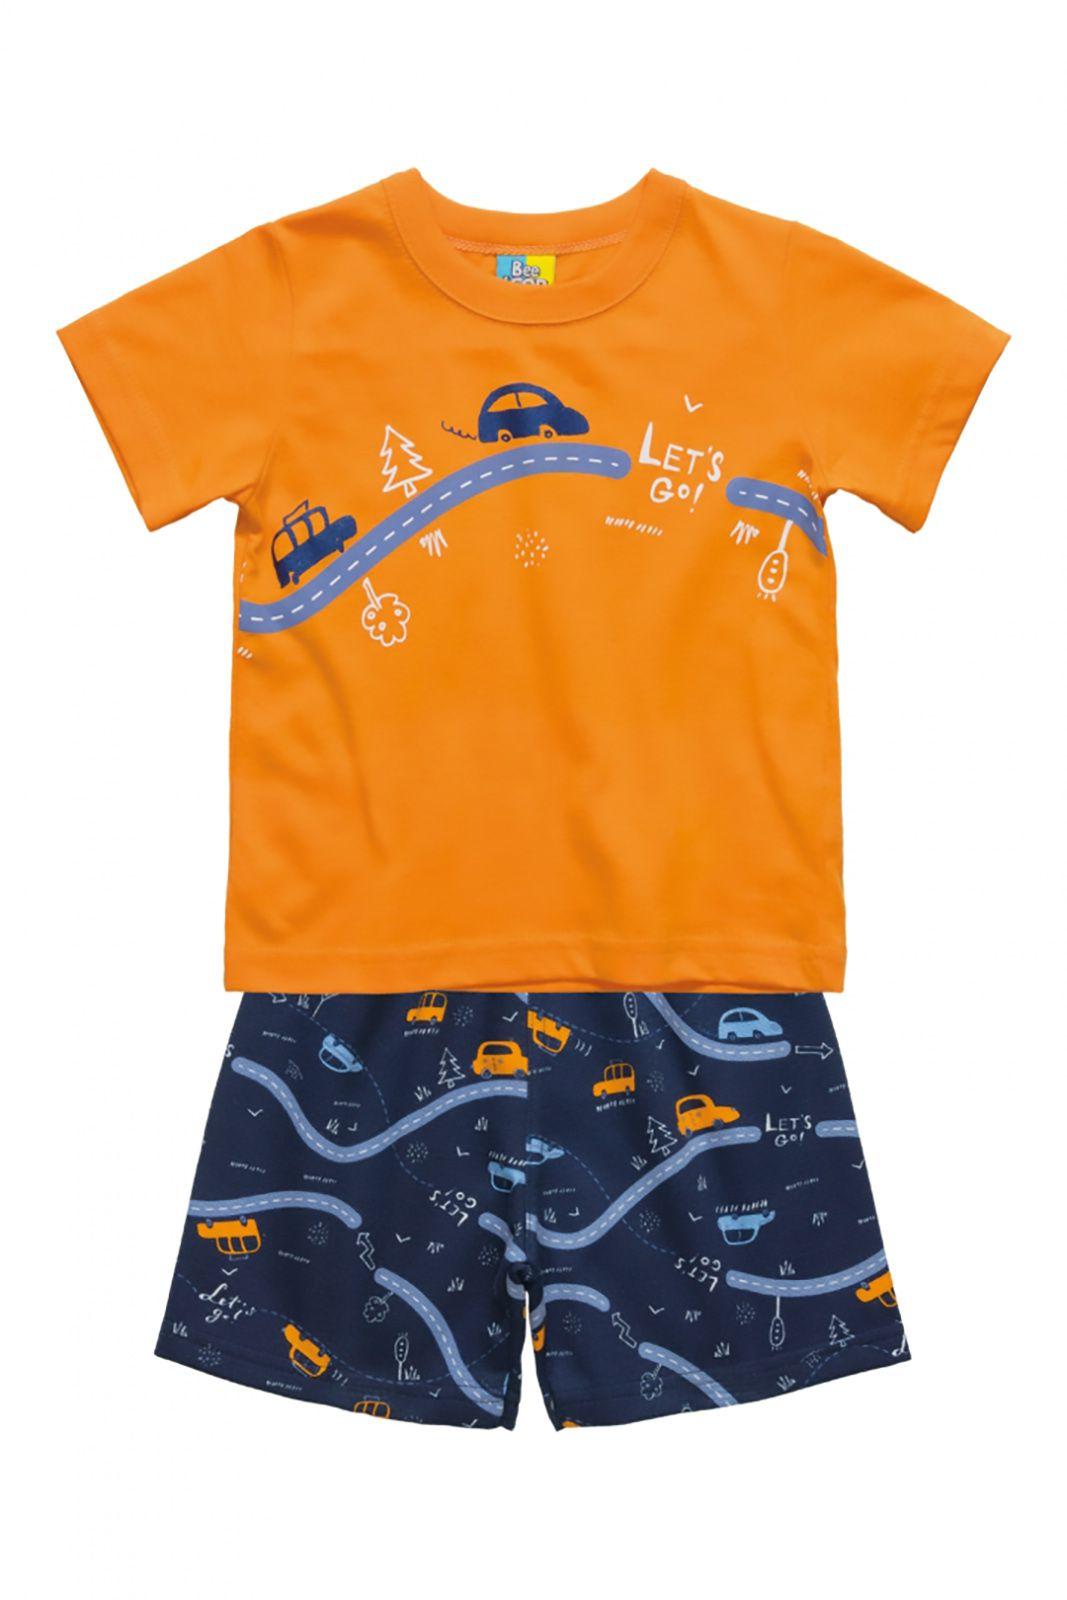 Conjunto Camiseta em meia malha e Bermuda Moletinho Bee Loop Carrinho Laranja/Marinho